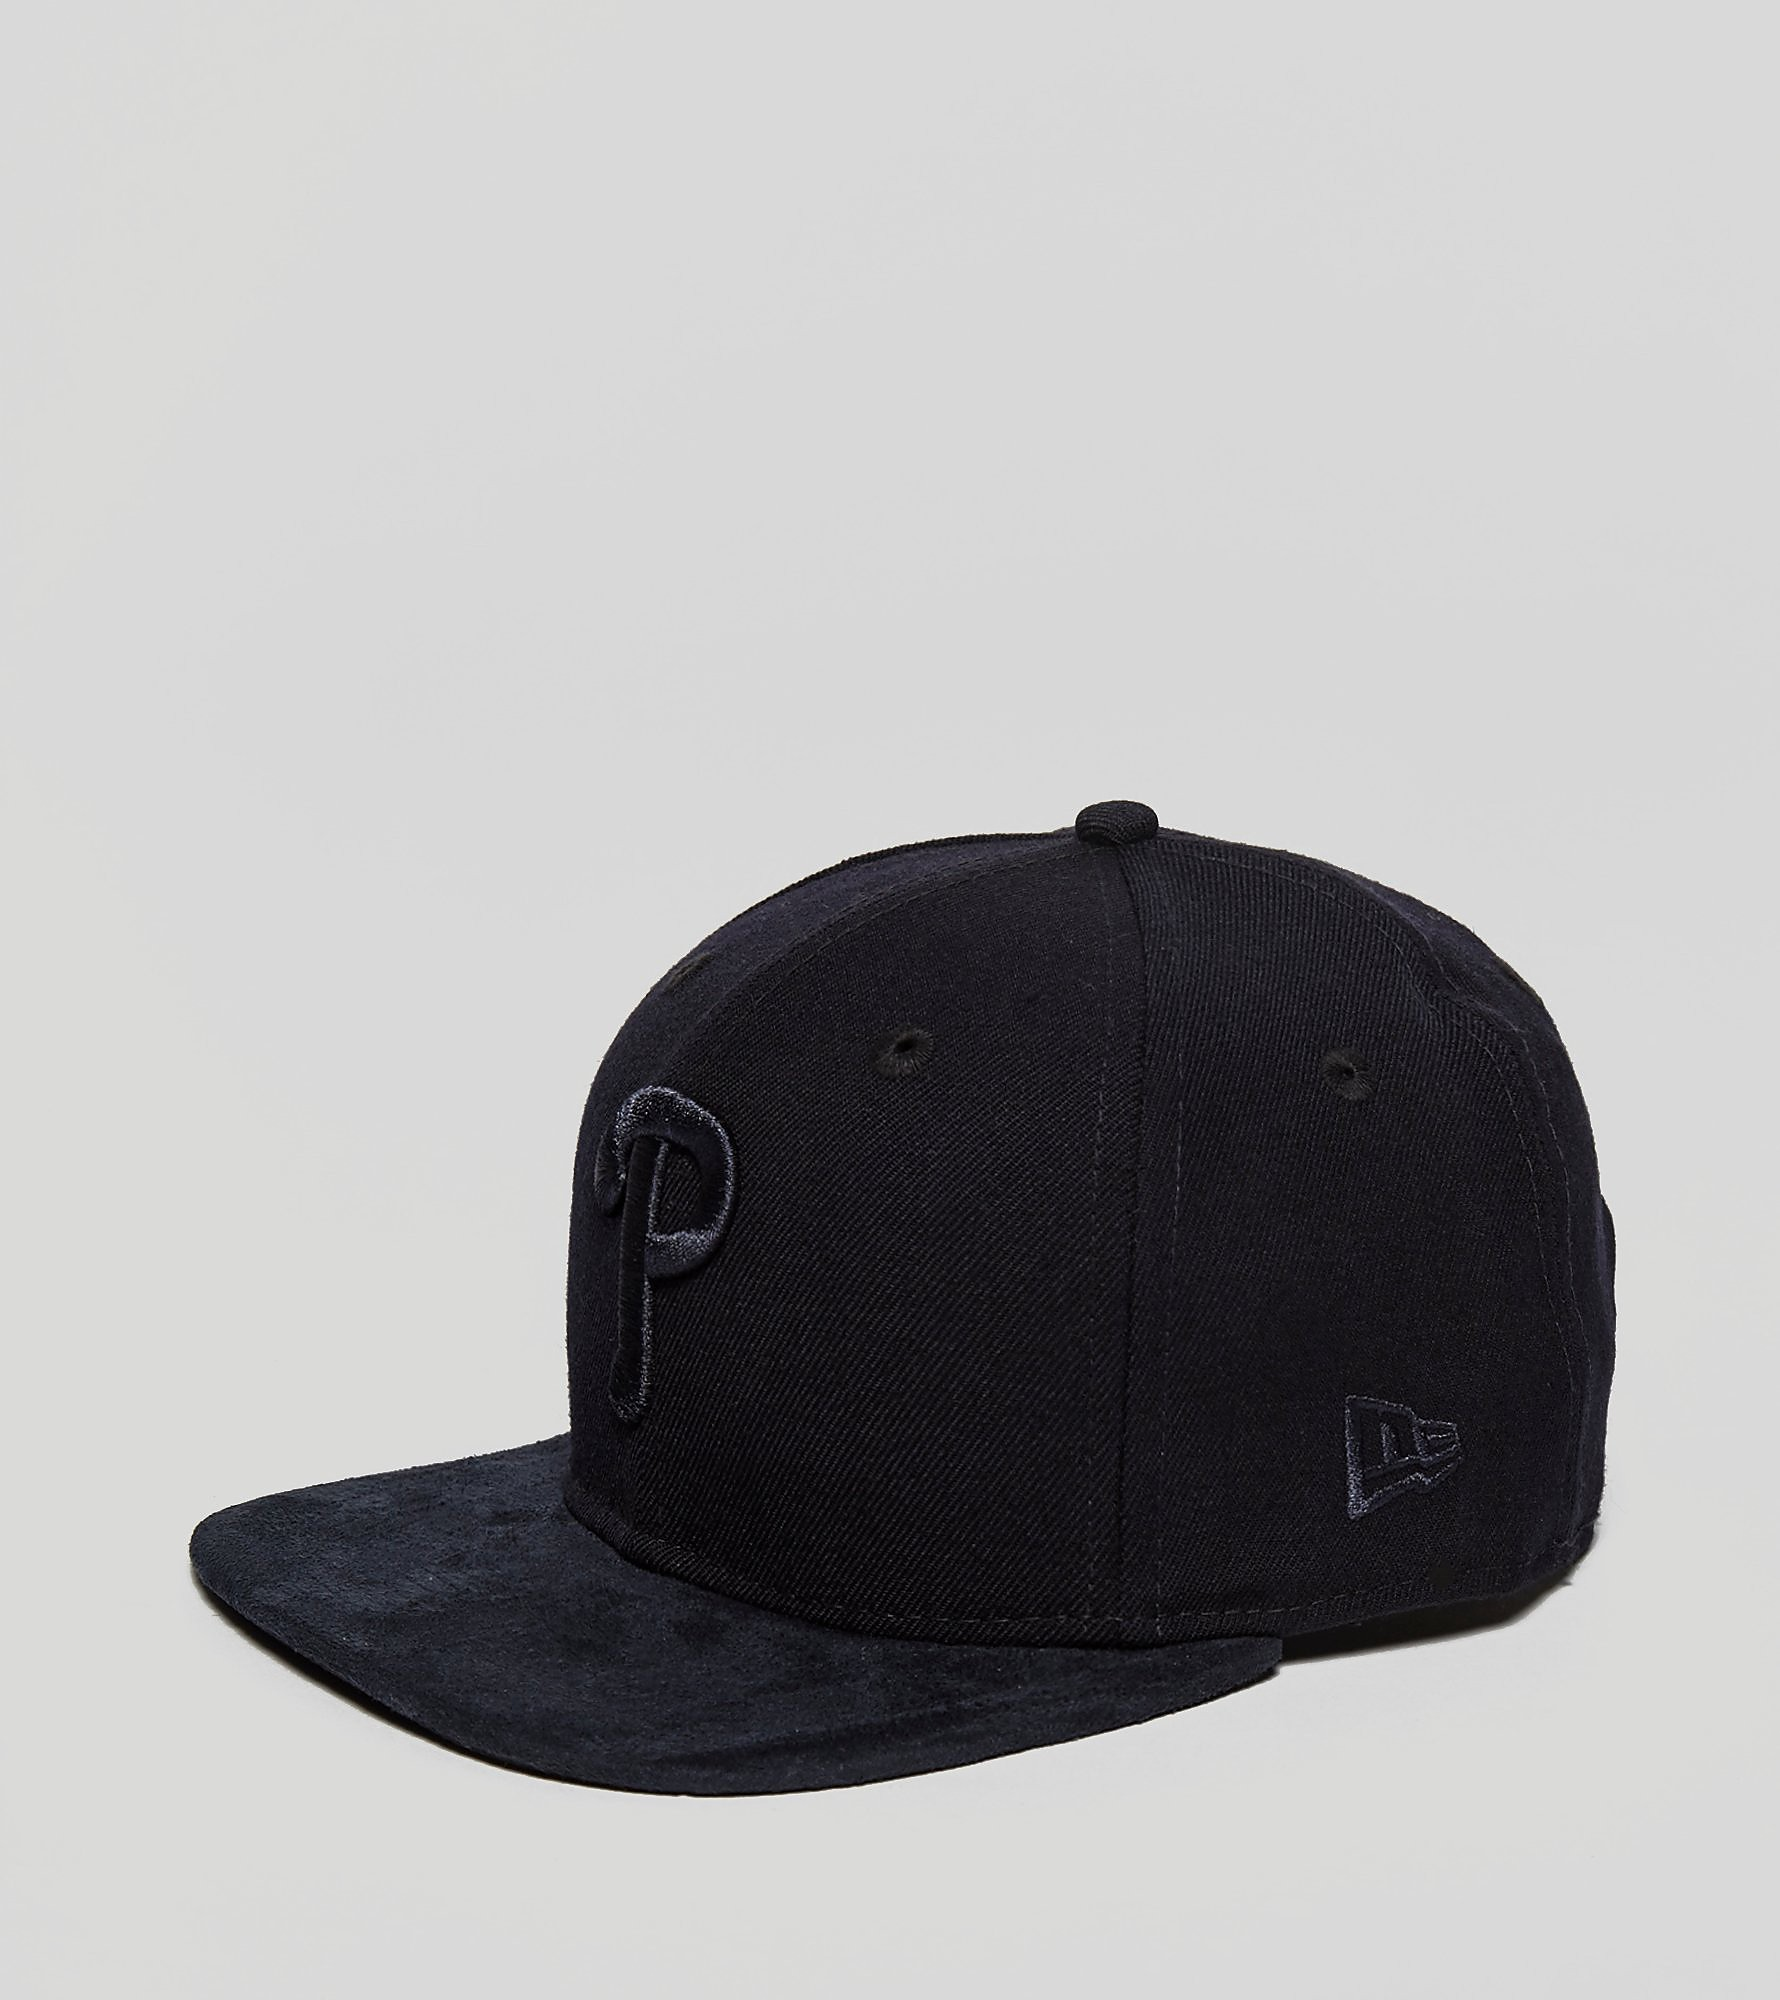 New Era Phillies 9FIFTY Snapback Cap - size? Exclusive